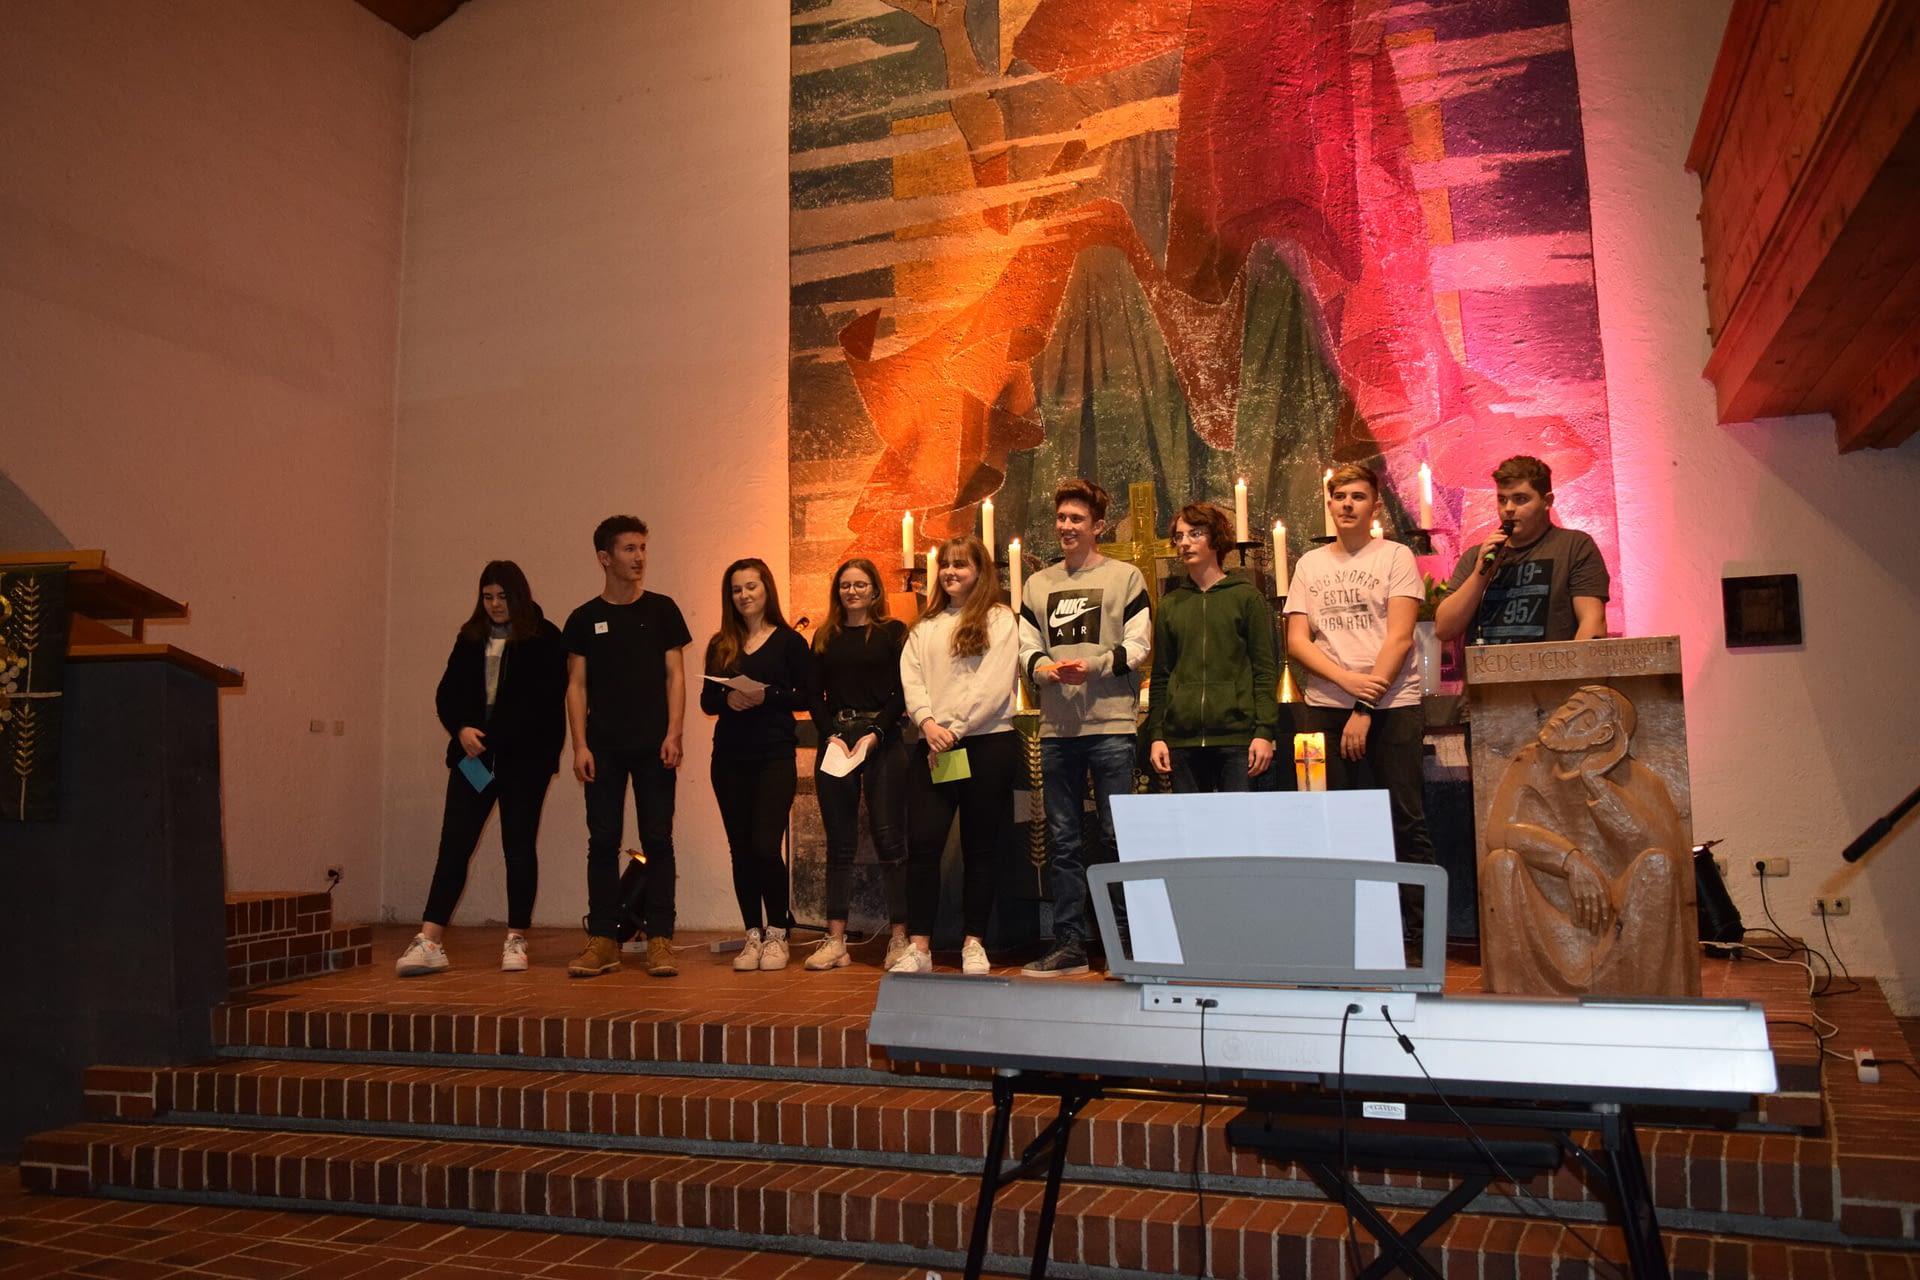 Jugendgottesdienst in Oberstdorf